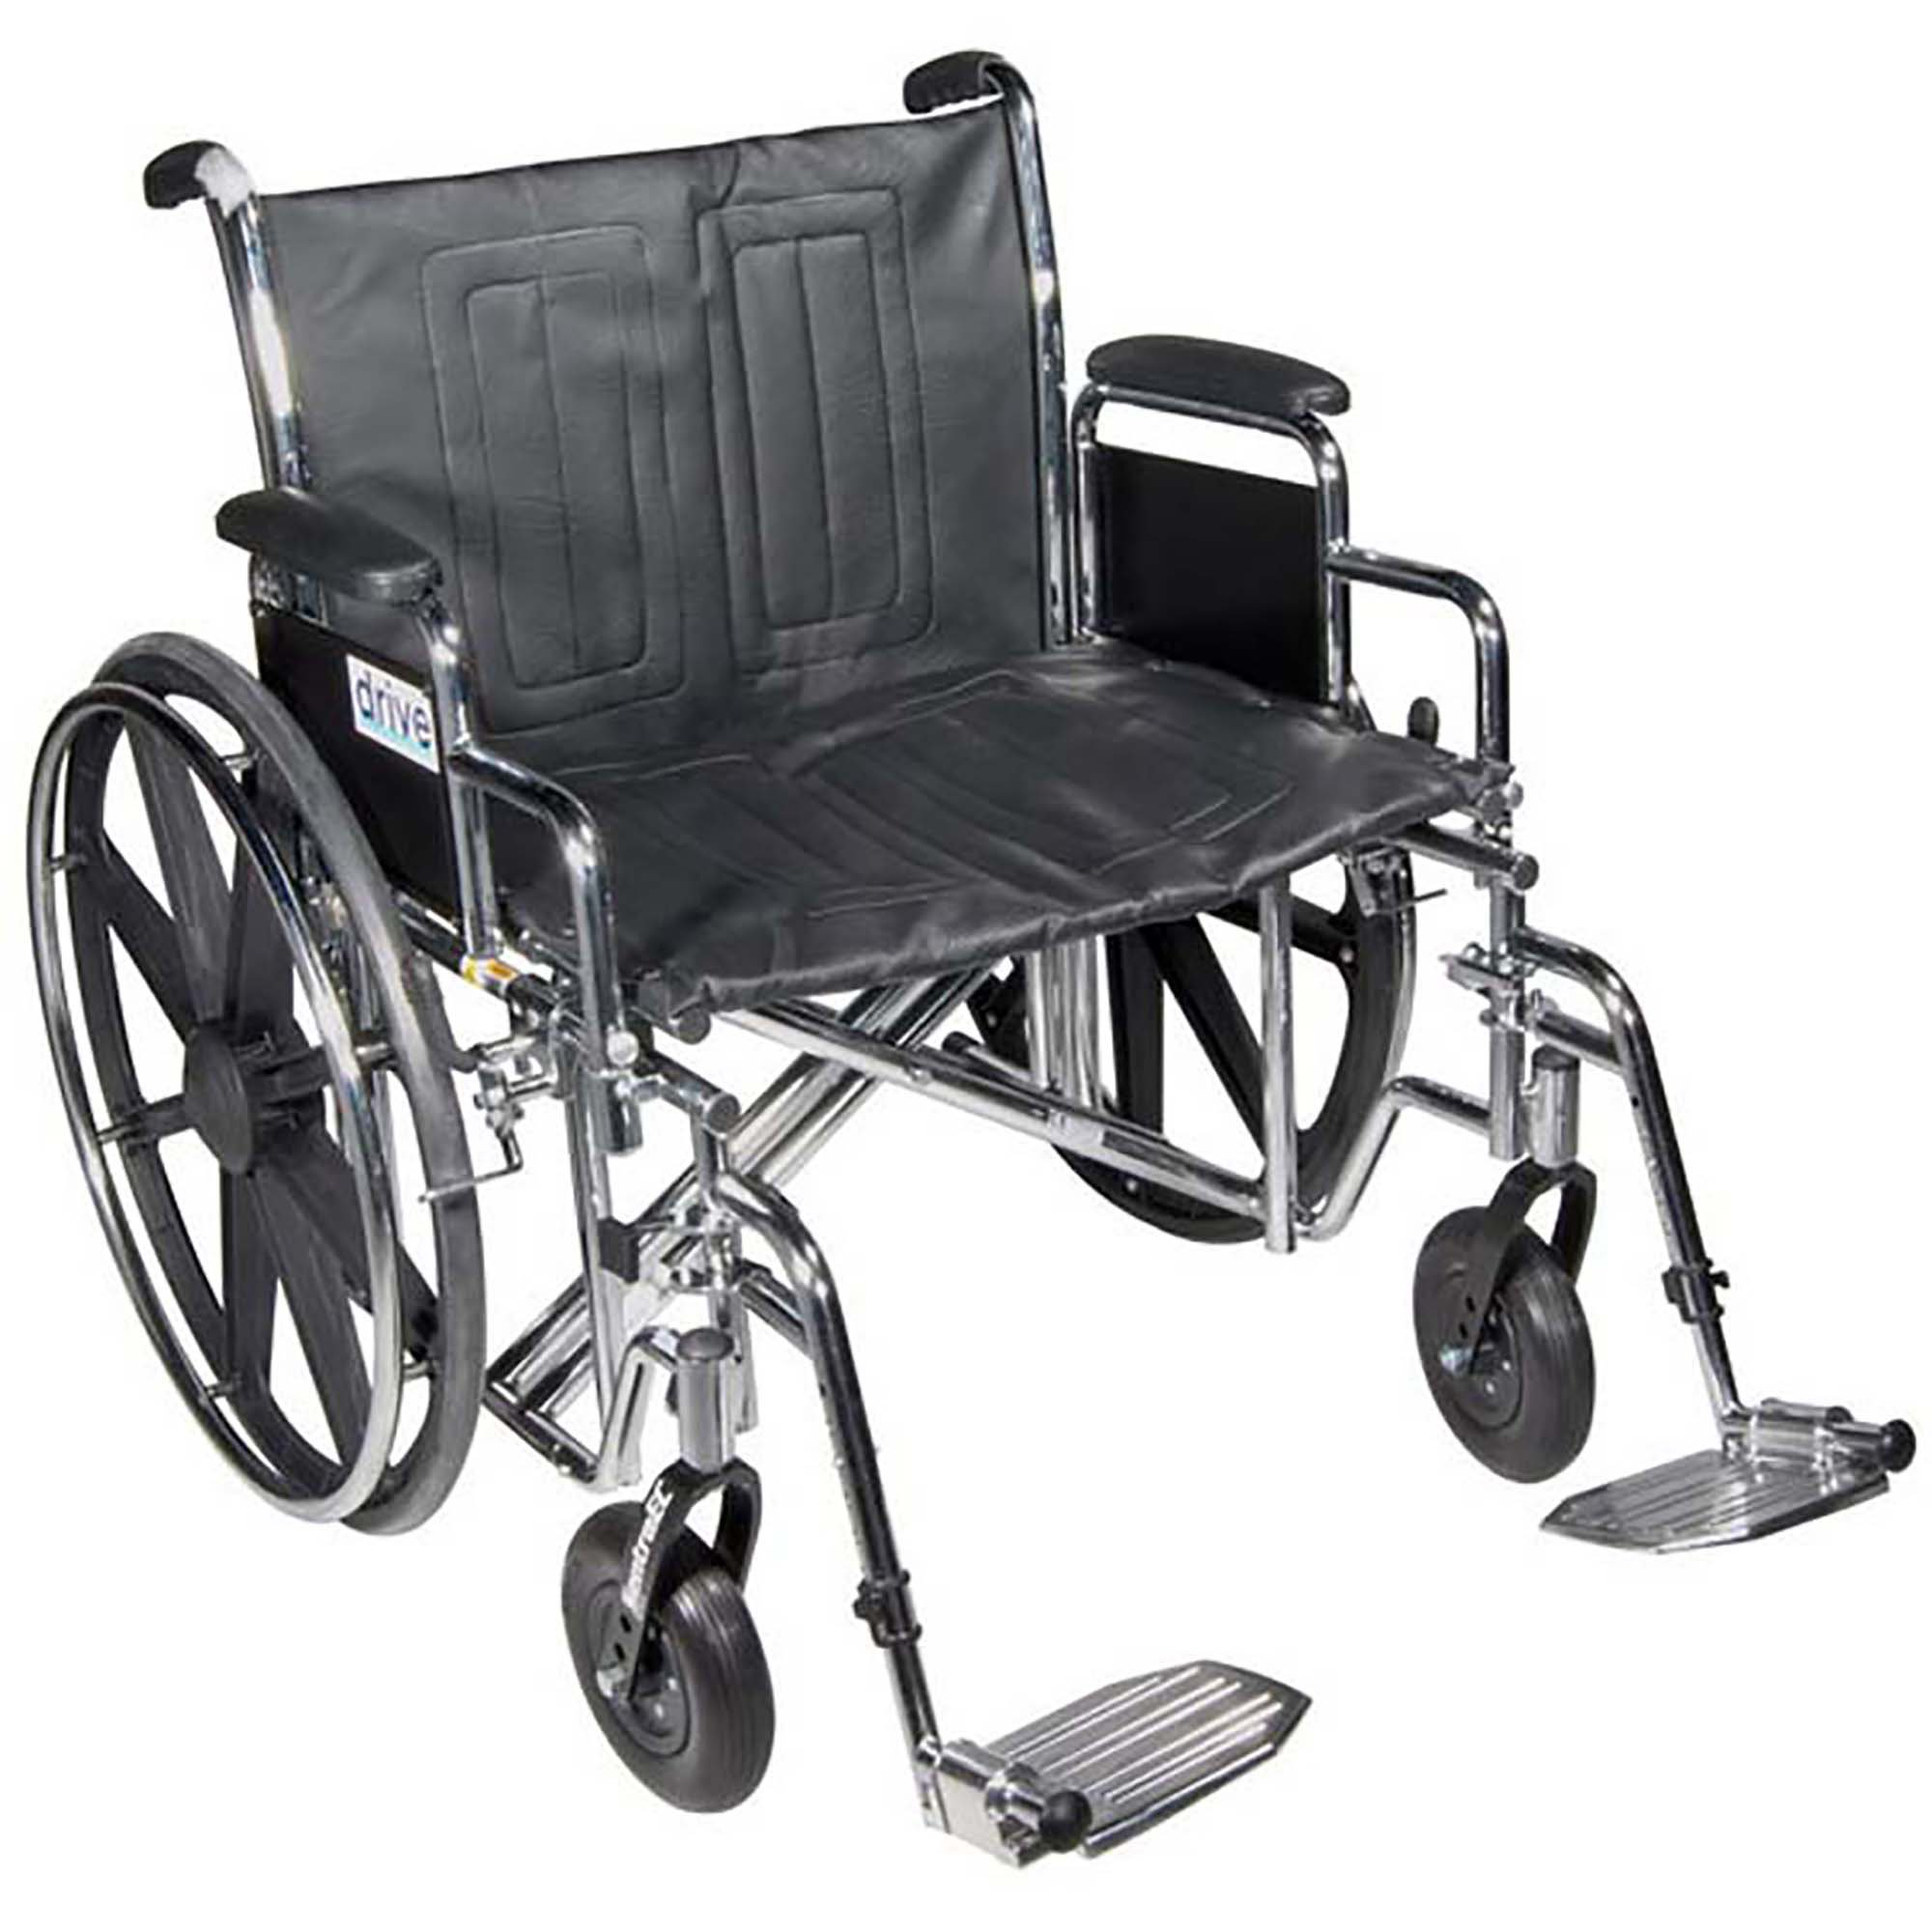 "drive Bariatric Sentra EC Heavy-Duty Wheelchair, Full Length Arm, Swing-Away Footrest, STD22ECDFA-SF, 22"" Seat Width - 1 Each"